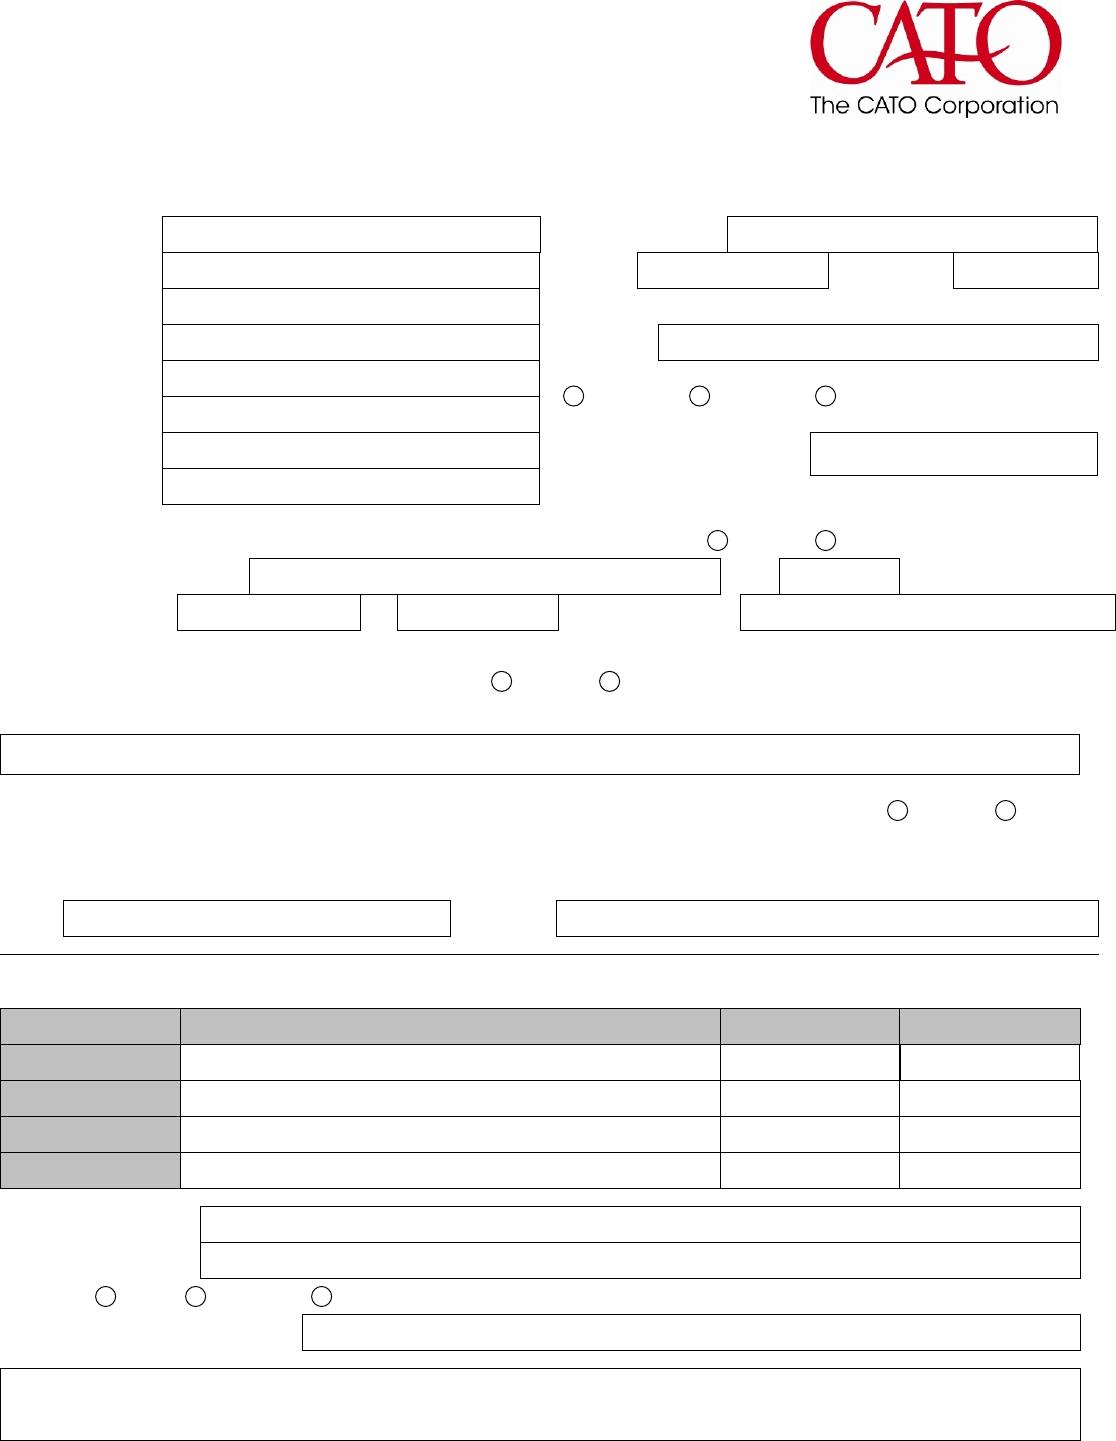 Free printable cato job application form falaconquin